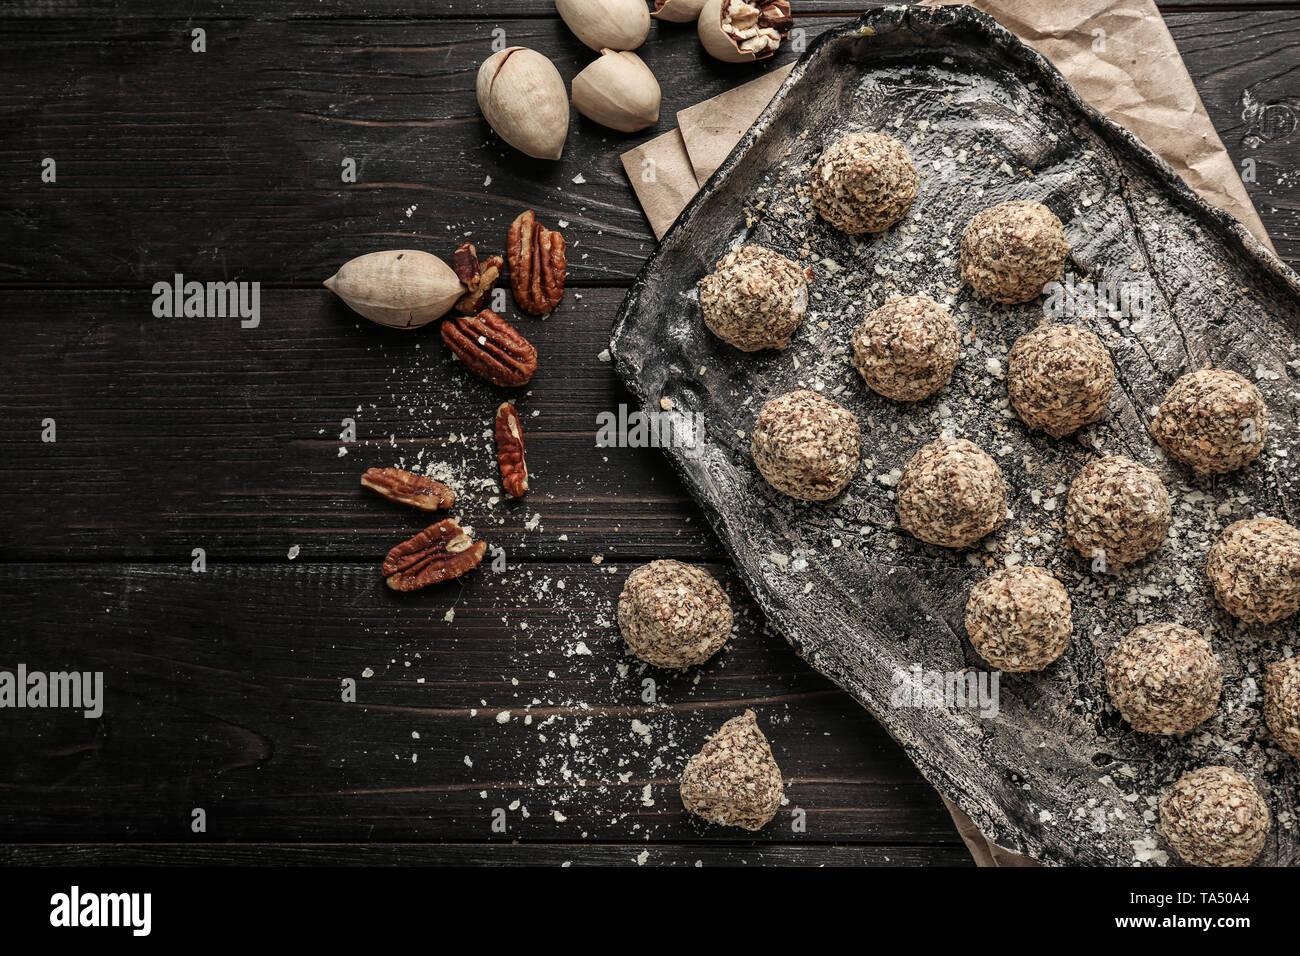 Placa con sabrosos dulces trufas en mesa de madera oscura Foto de stock